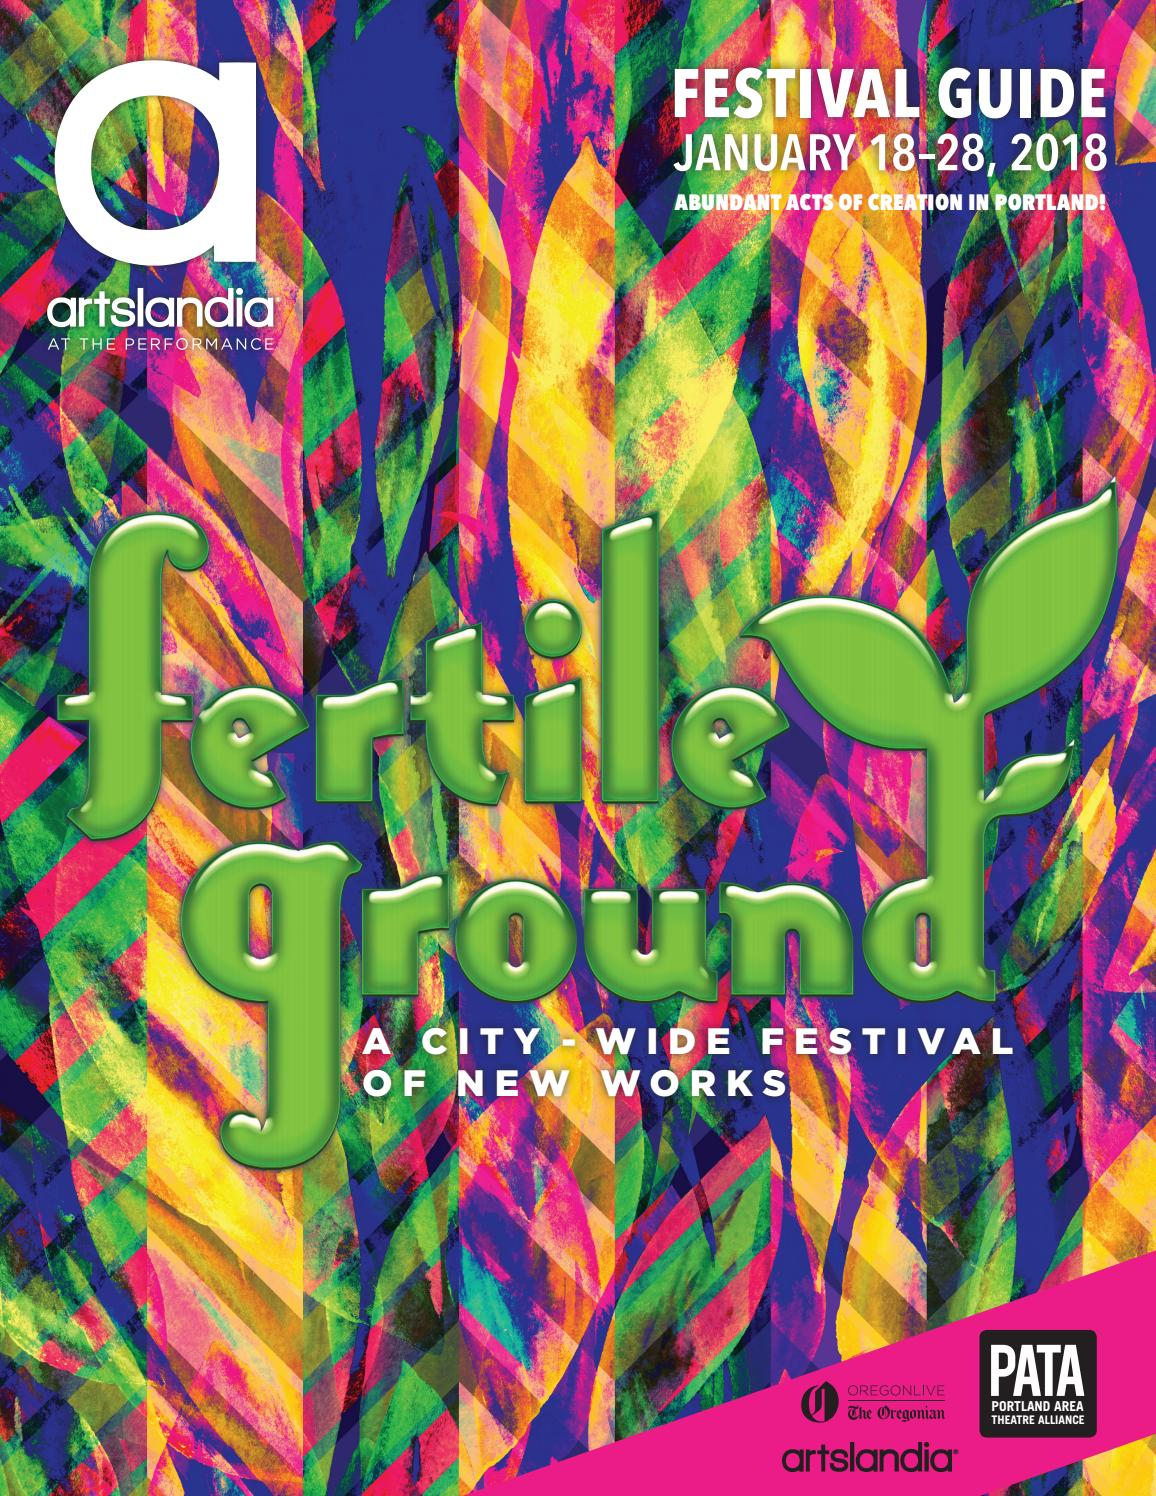 dcf1df62558 2018 Fertile Ground Festival Guide by Artslandia - issuu